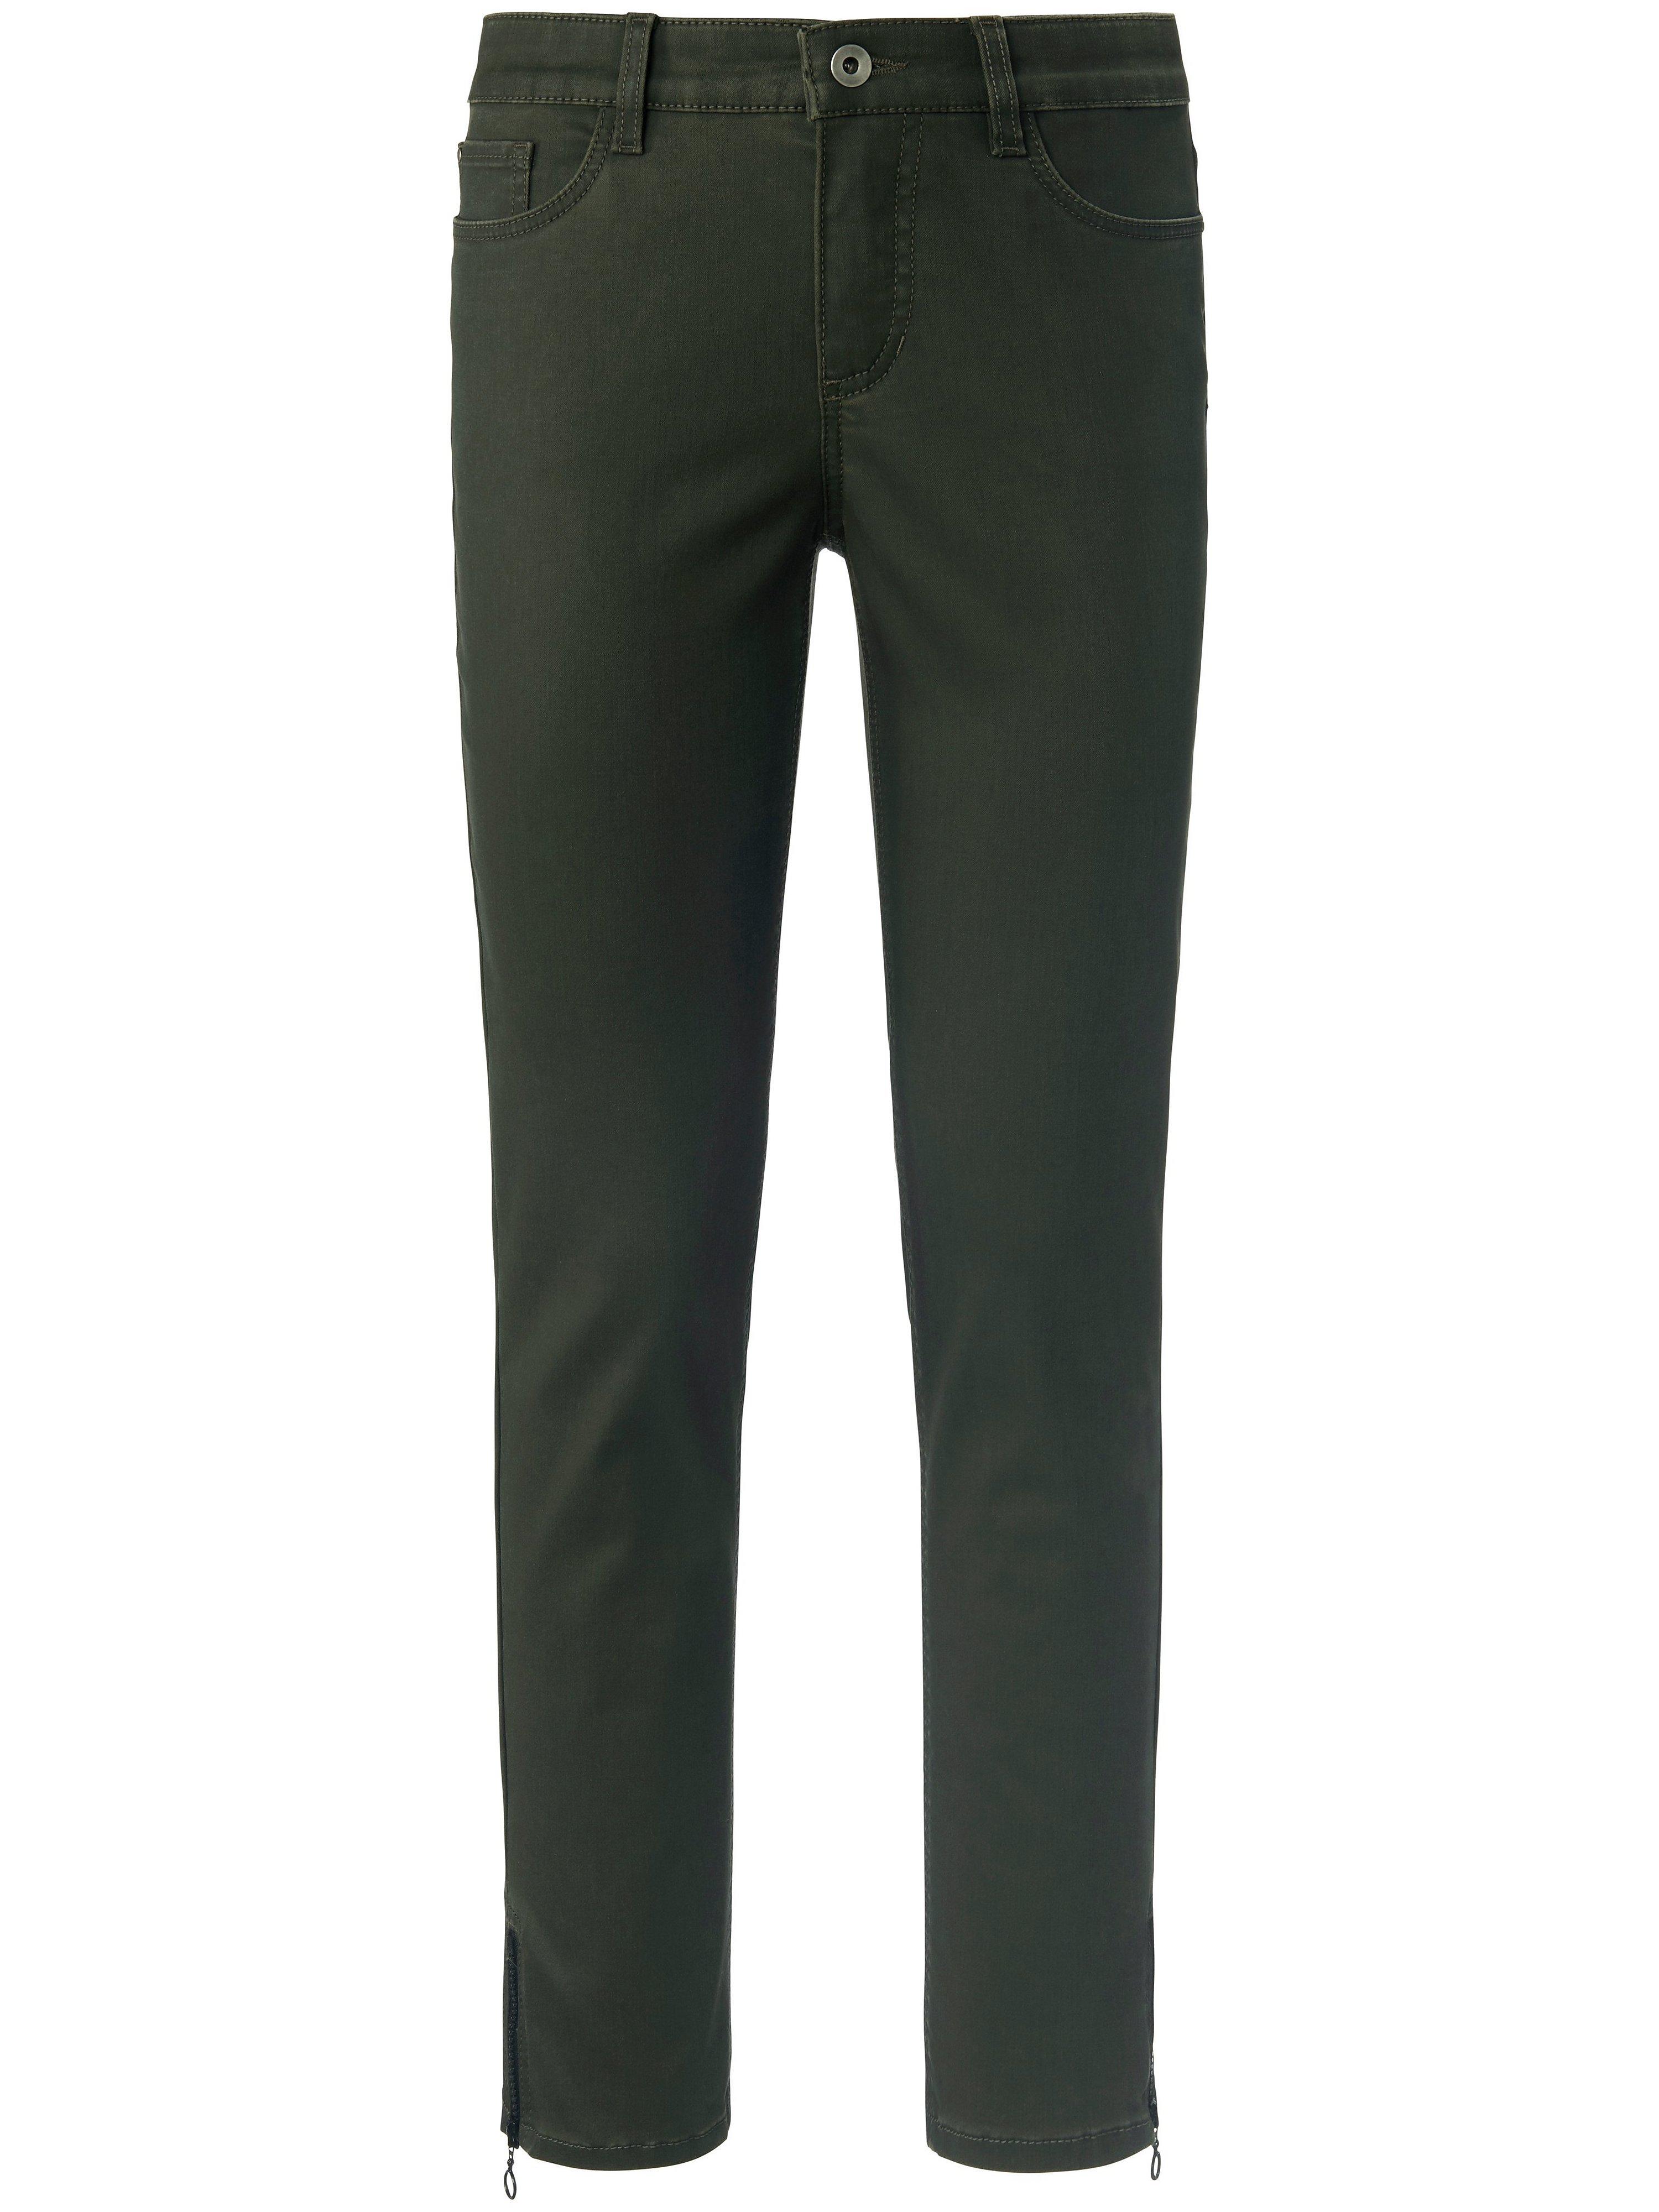 Enkellange broek pasvorm Sylvia Van Peter Hahn groen